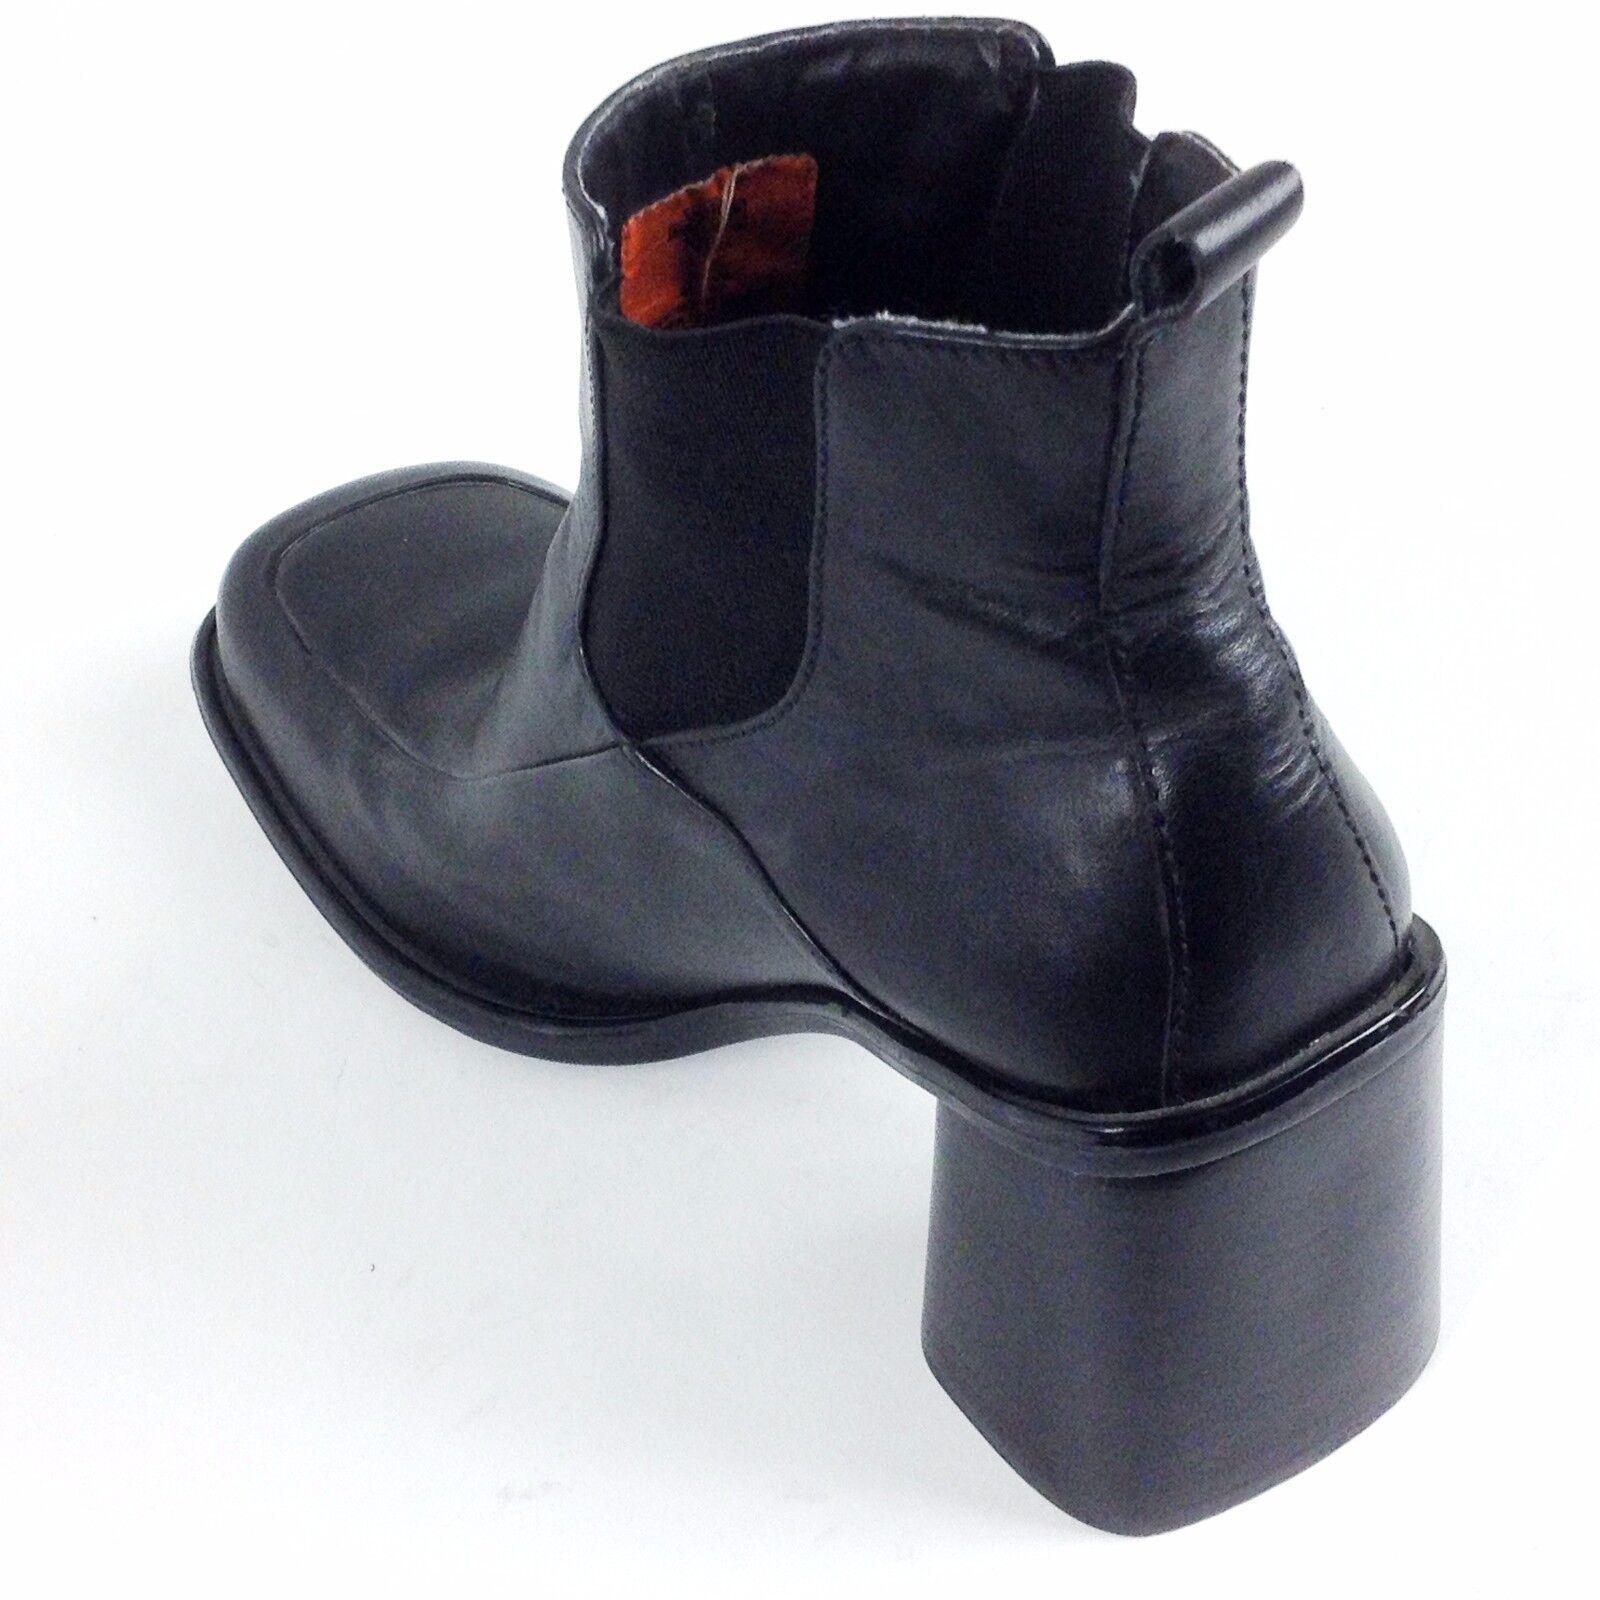 Harley-Davidson Damens Damens Harley-Davidson BLACK  TRIBECA GORE BOOT STYLE #  81197 SIZE  9 7b040d